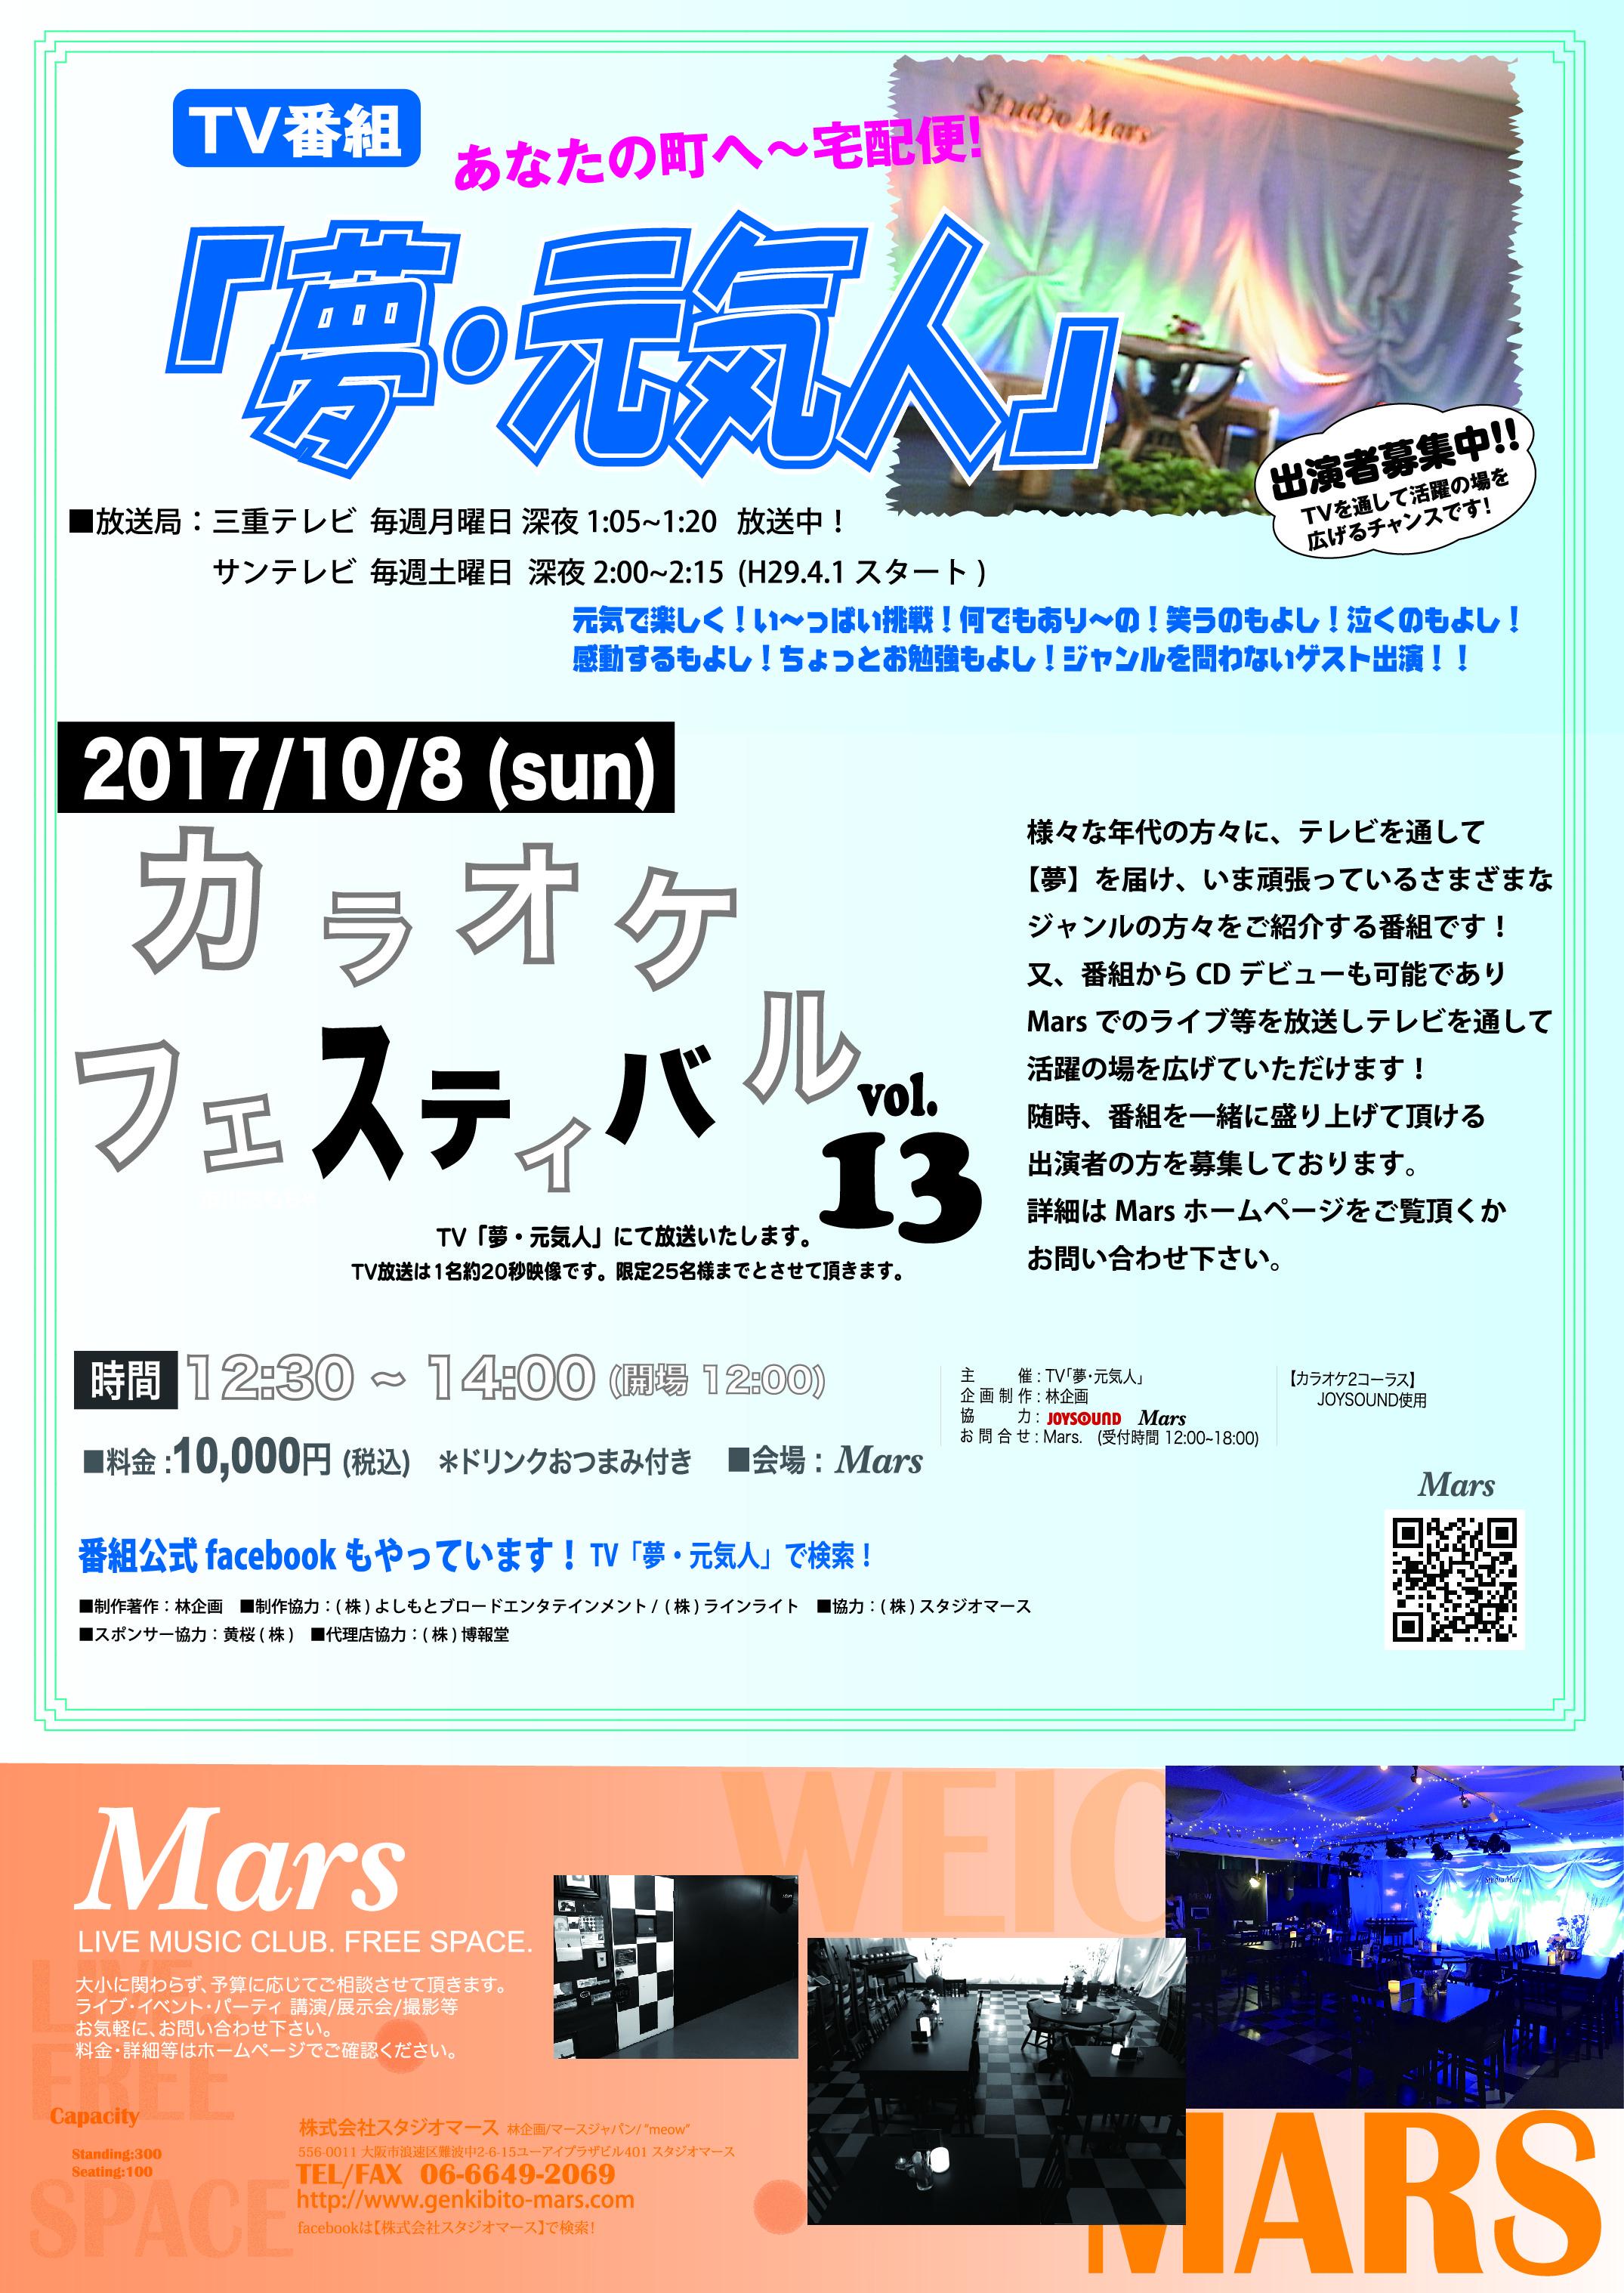 B5_tate omote [更新済み].eps -01.jpg